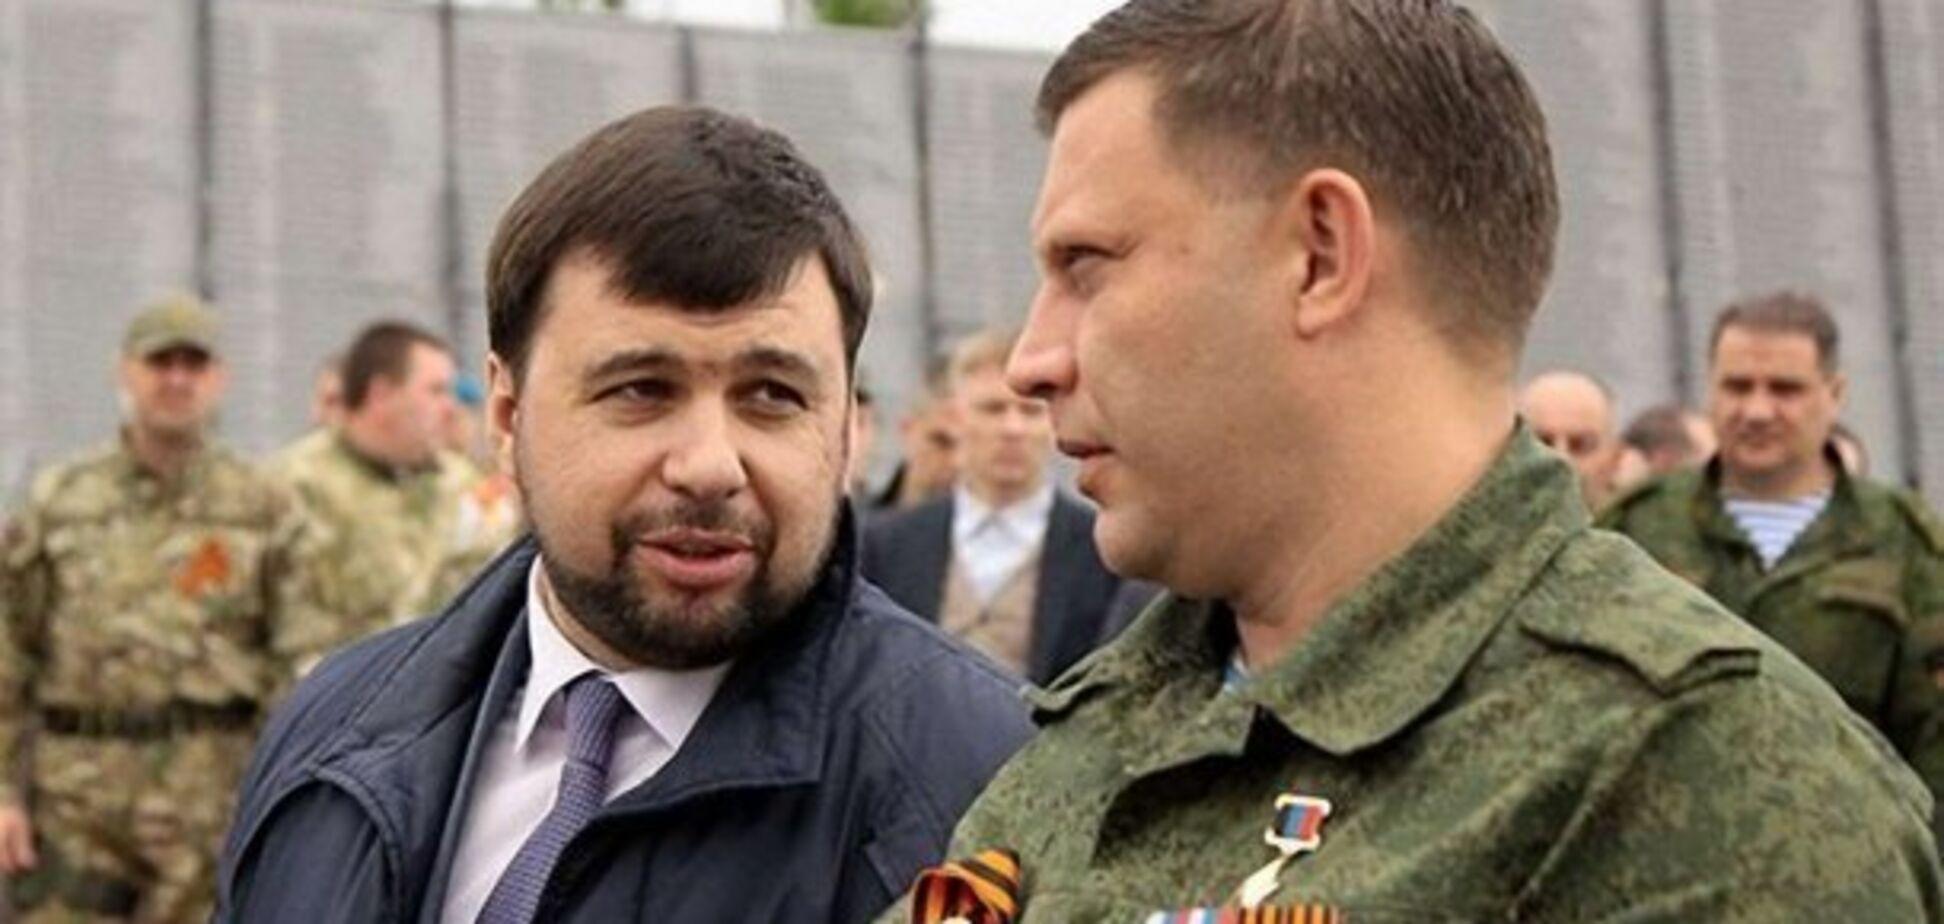 Падеж 'новоросов': бумеранг имени Сани Захарченко